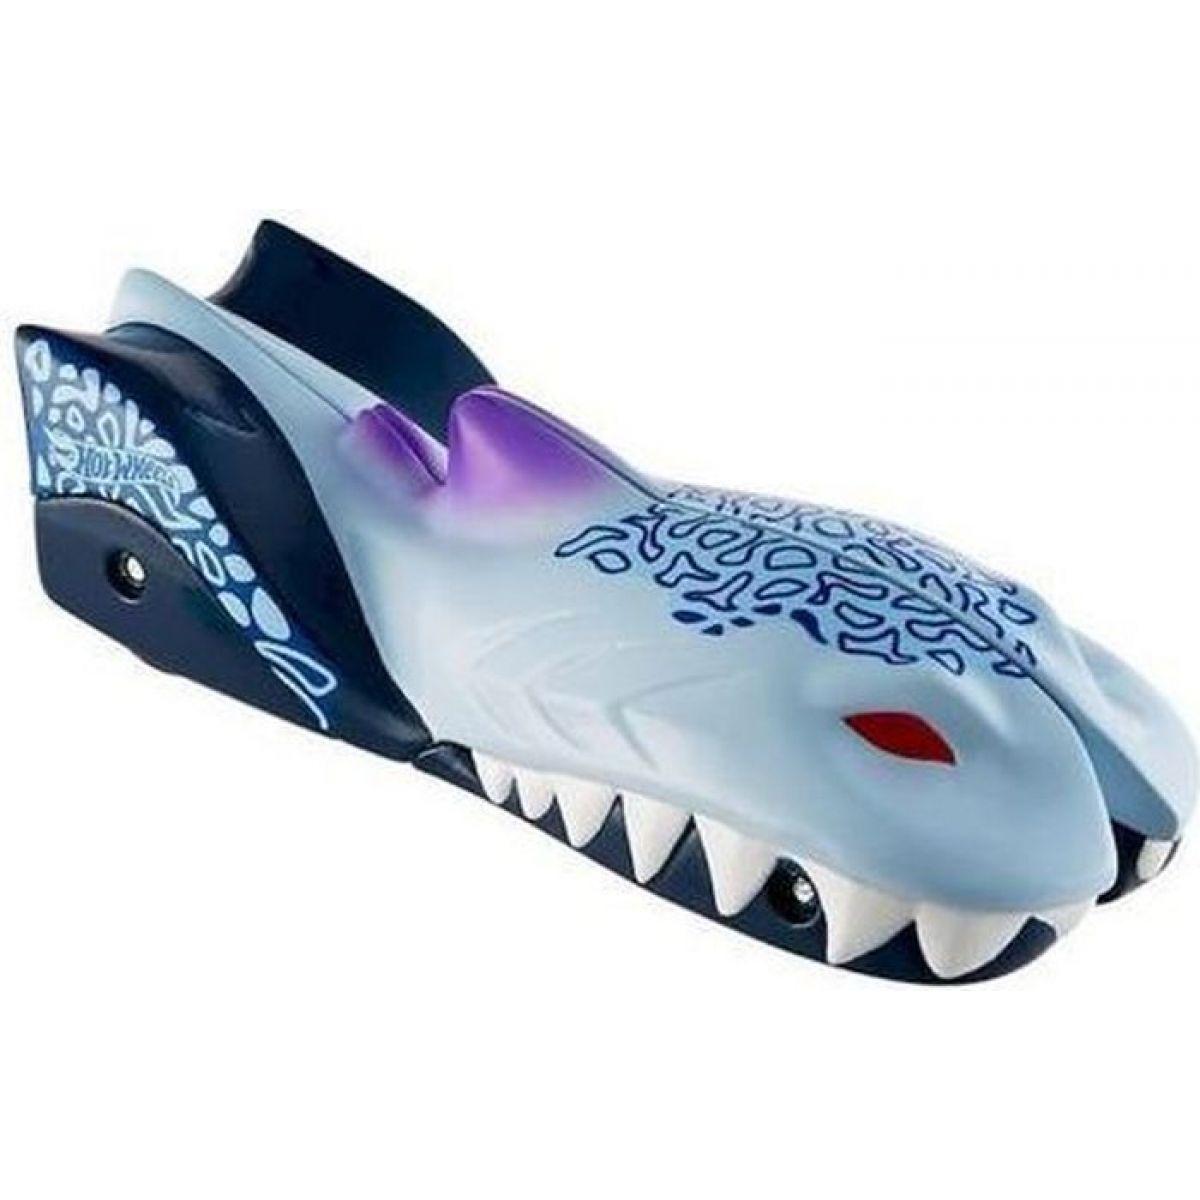 Hot Wheels Split speeders auto - Shark Tearor